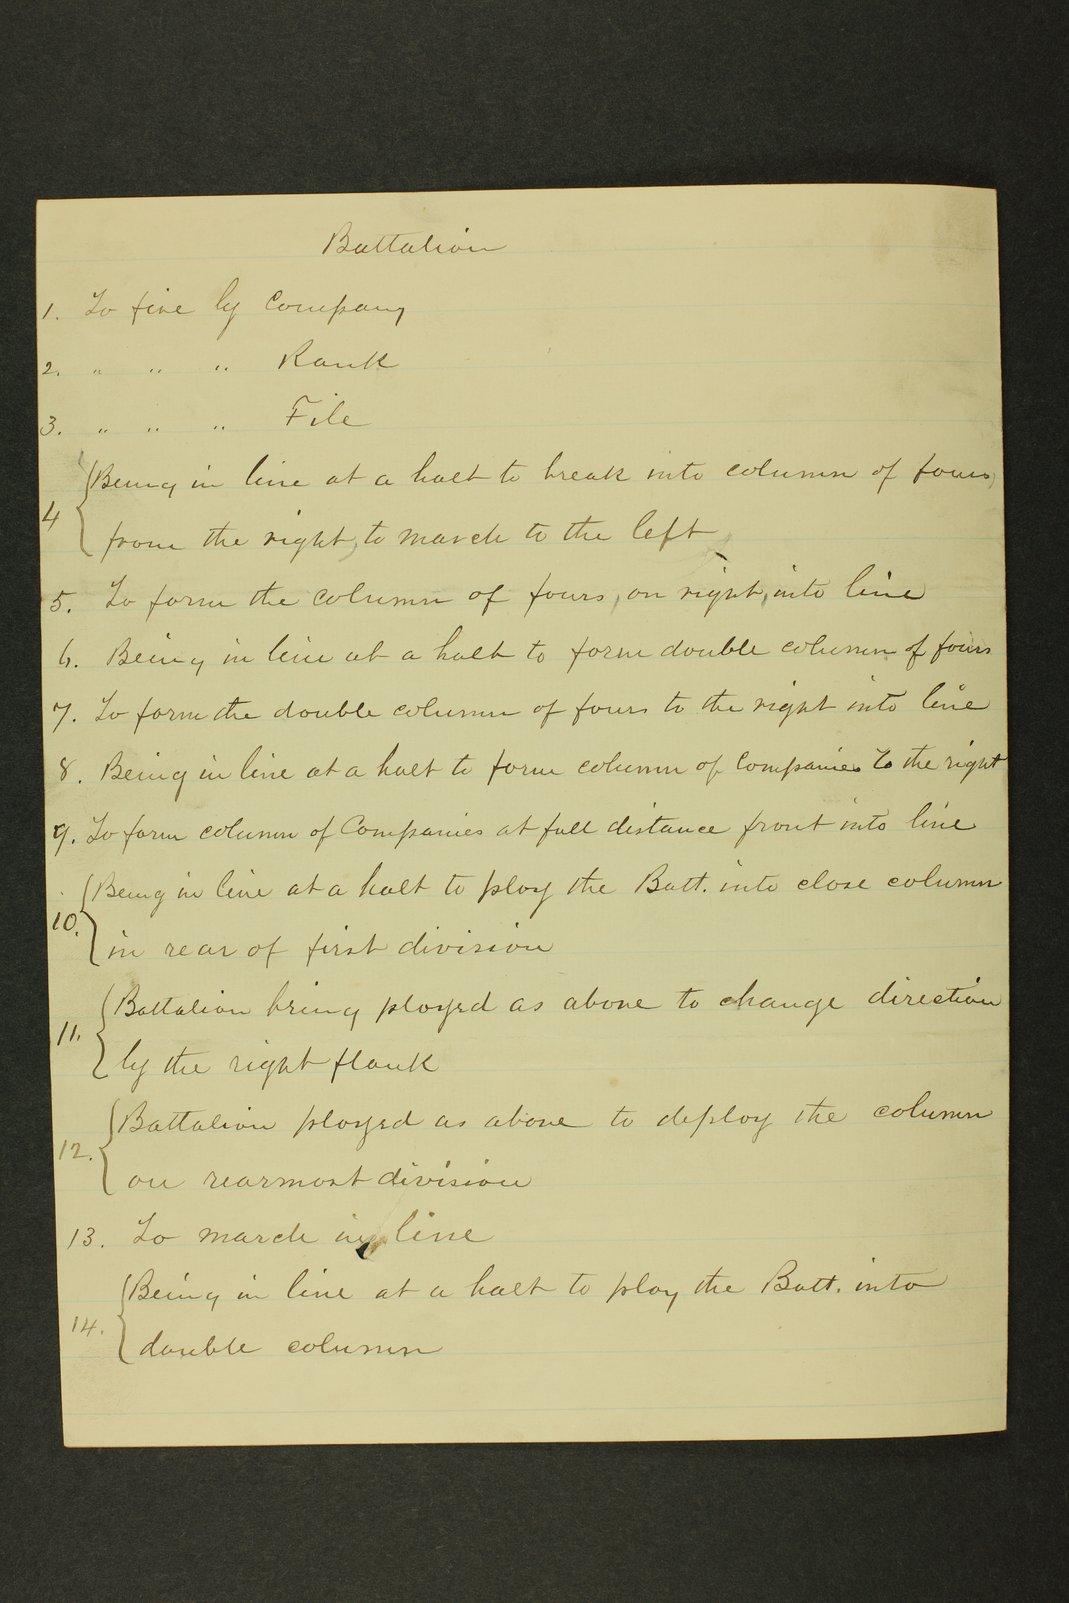 Kansas Adjutant General miscellaneous correpondence - 1 [January - May 1886]